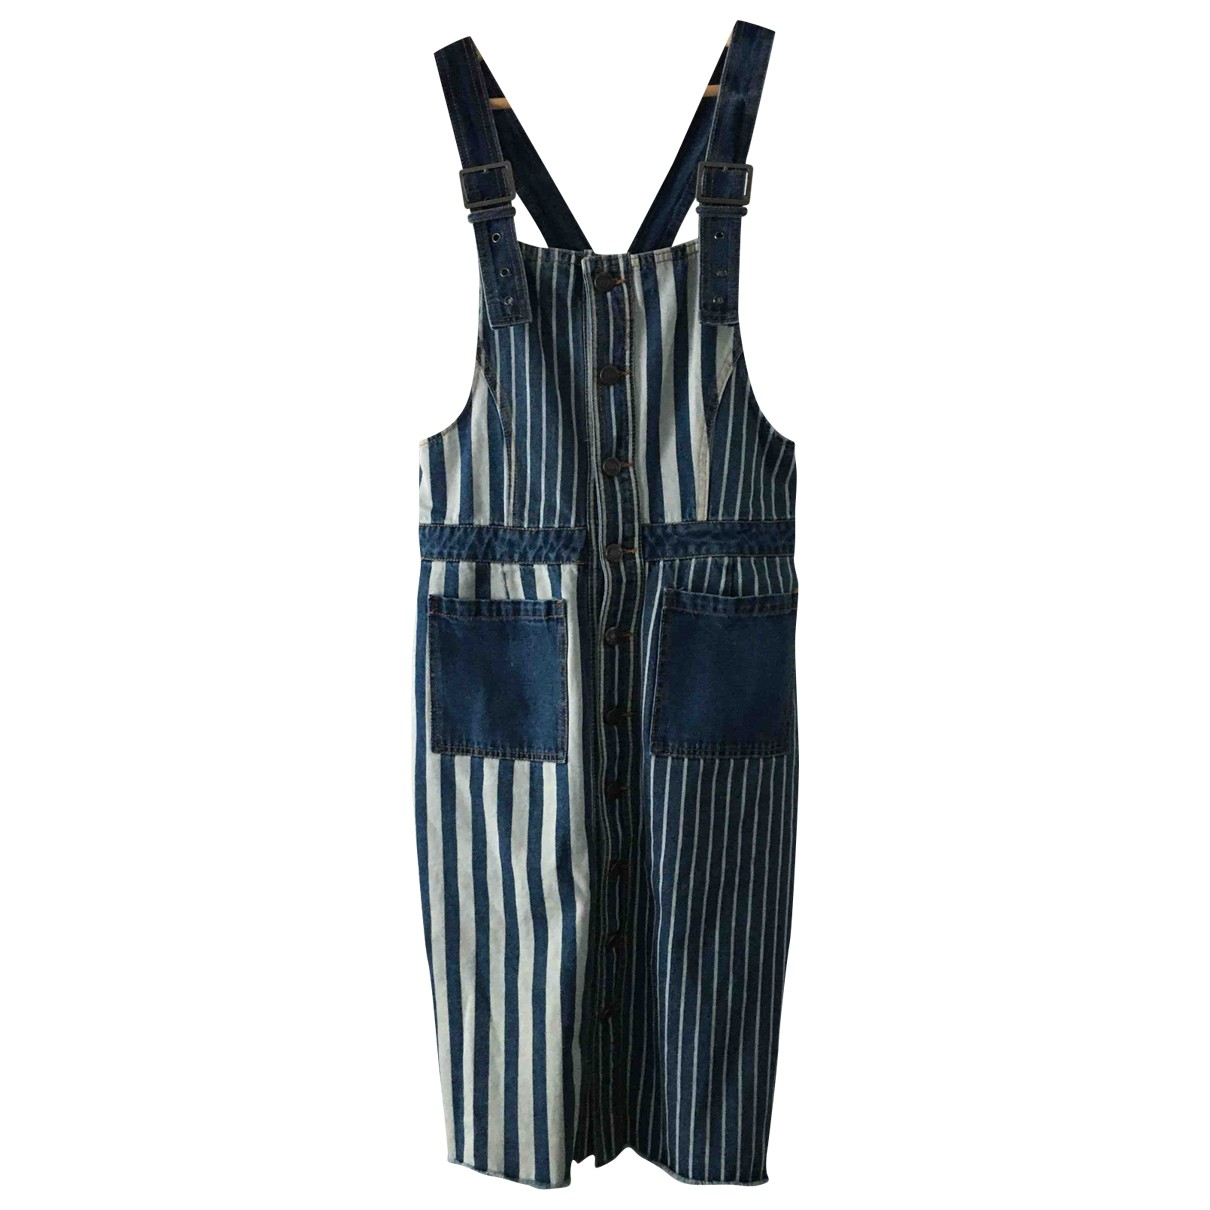 Urban Outfitters - Robe   pour femme en coton - bleu